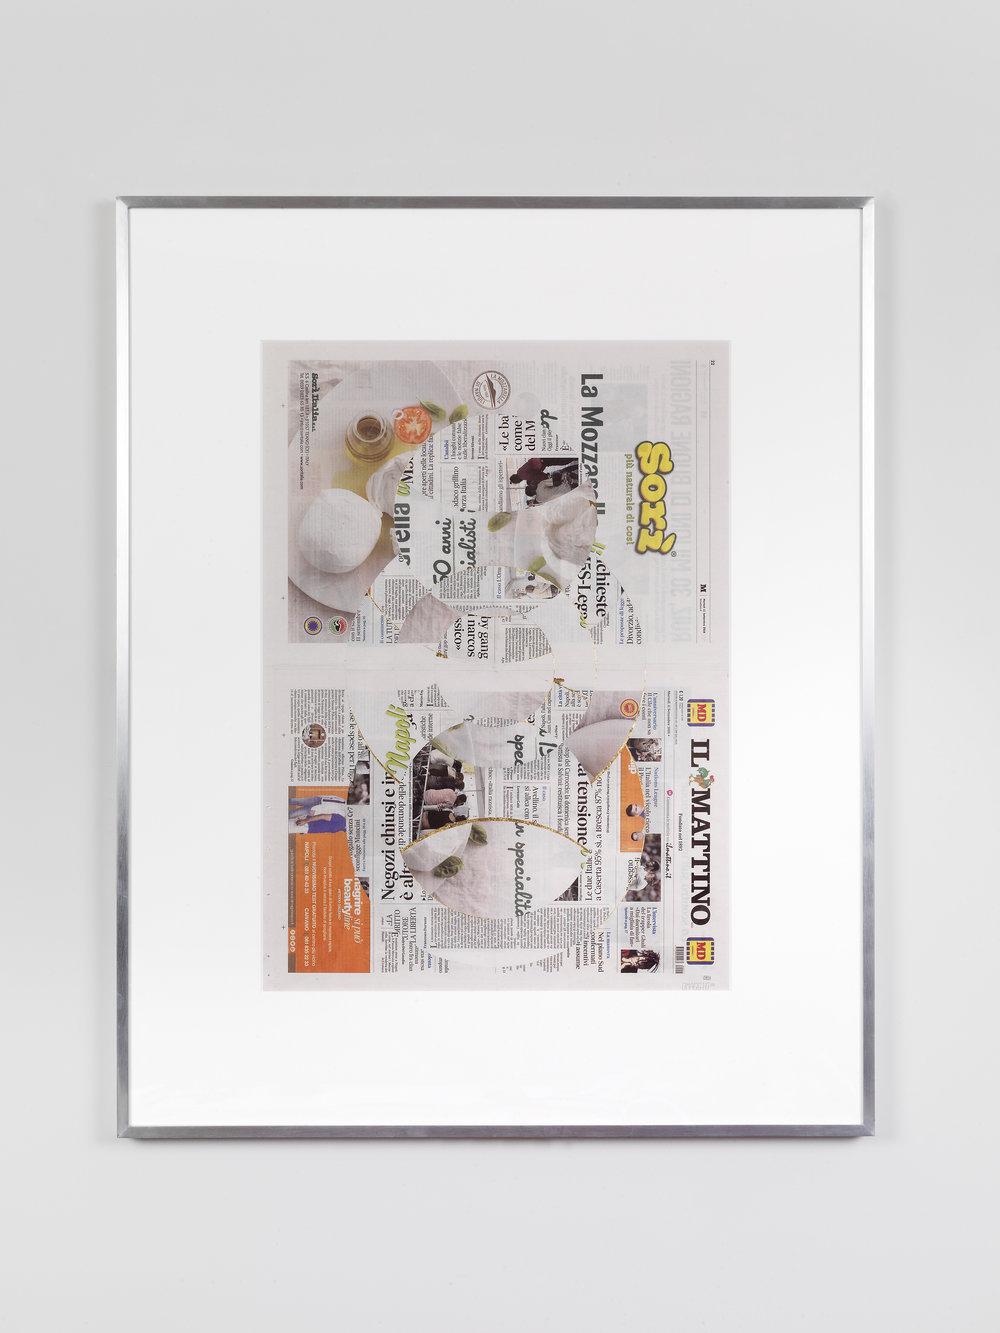 Il Mattino, Martedi 11 Settembre 2018    2018   Newspaper, tape, and 22 karat gold leaf  39 3/8 x 31 1/2 inches   Blind Collages, 2017–